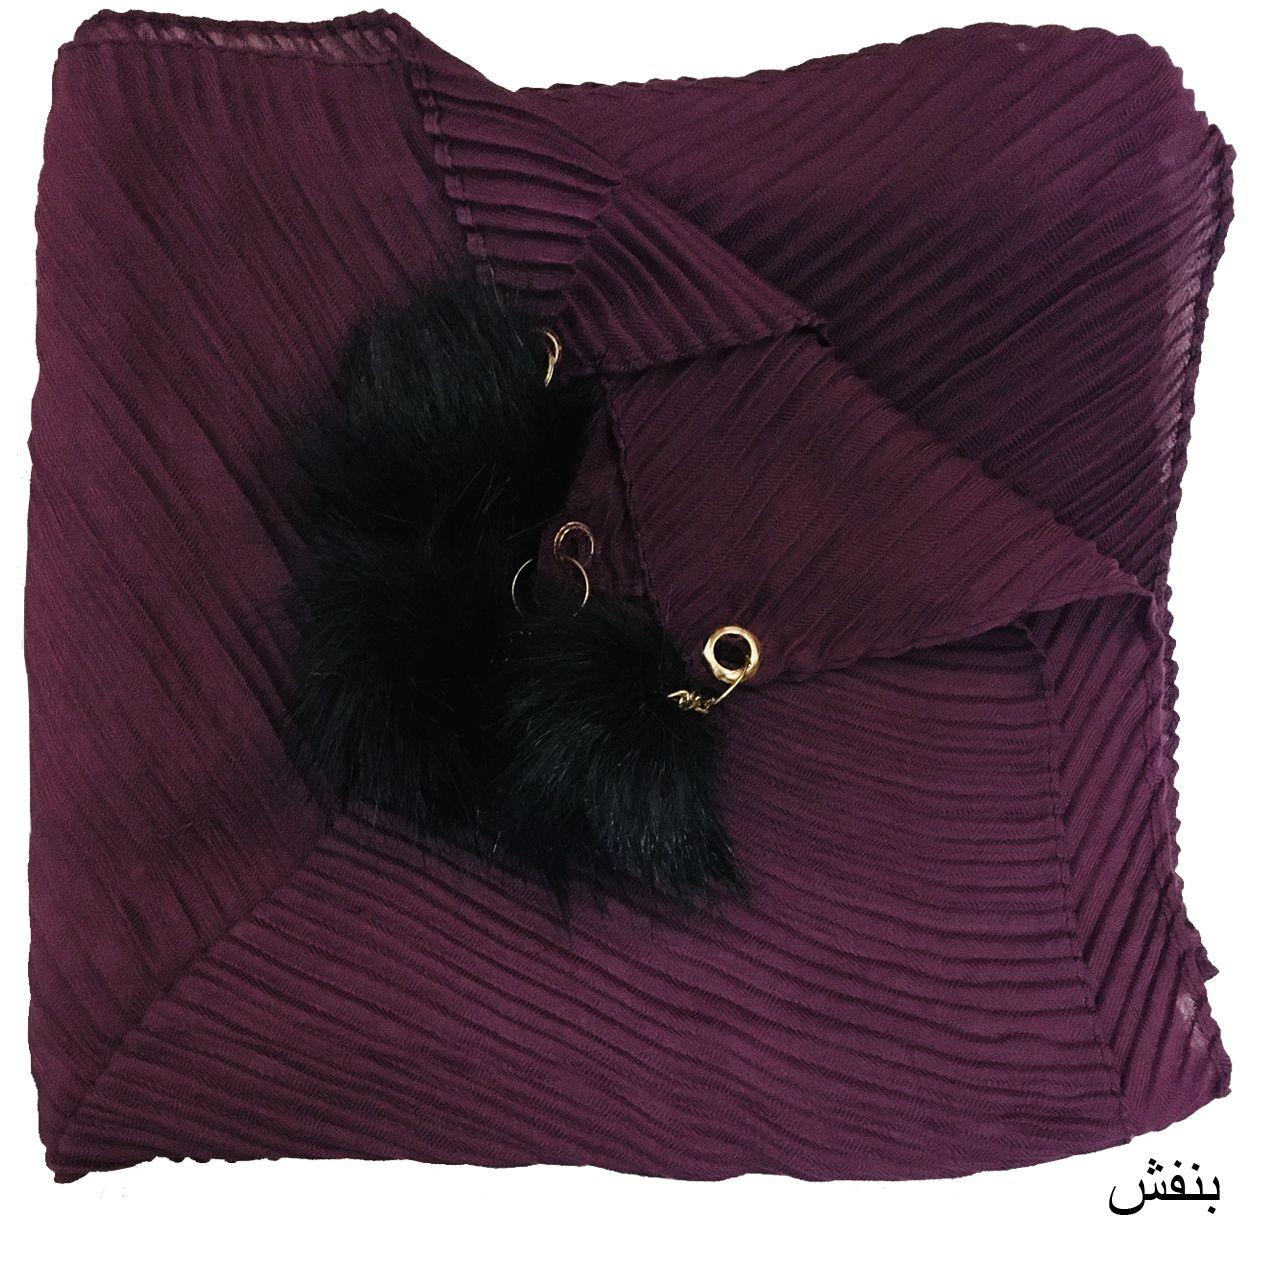 روسری زنانه کد 0206 -  - 7